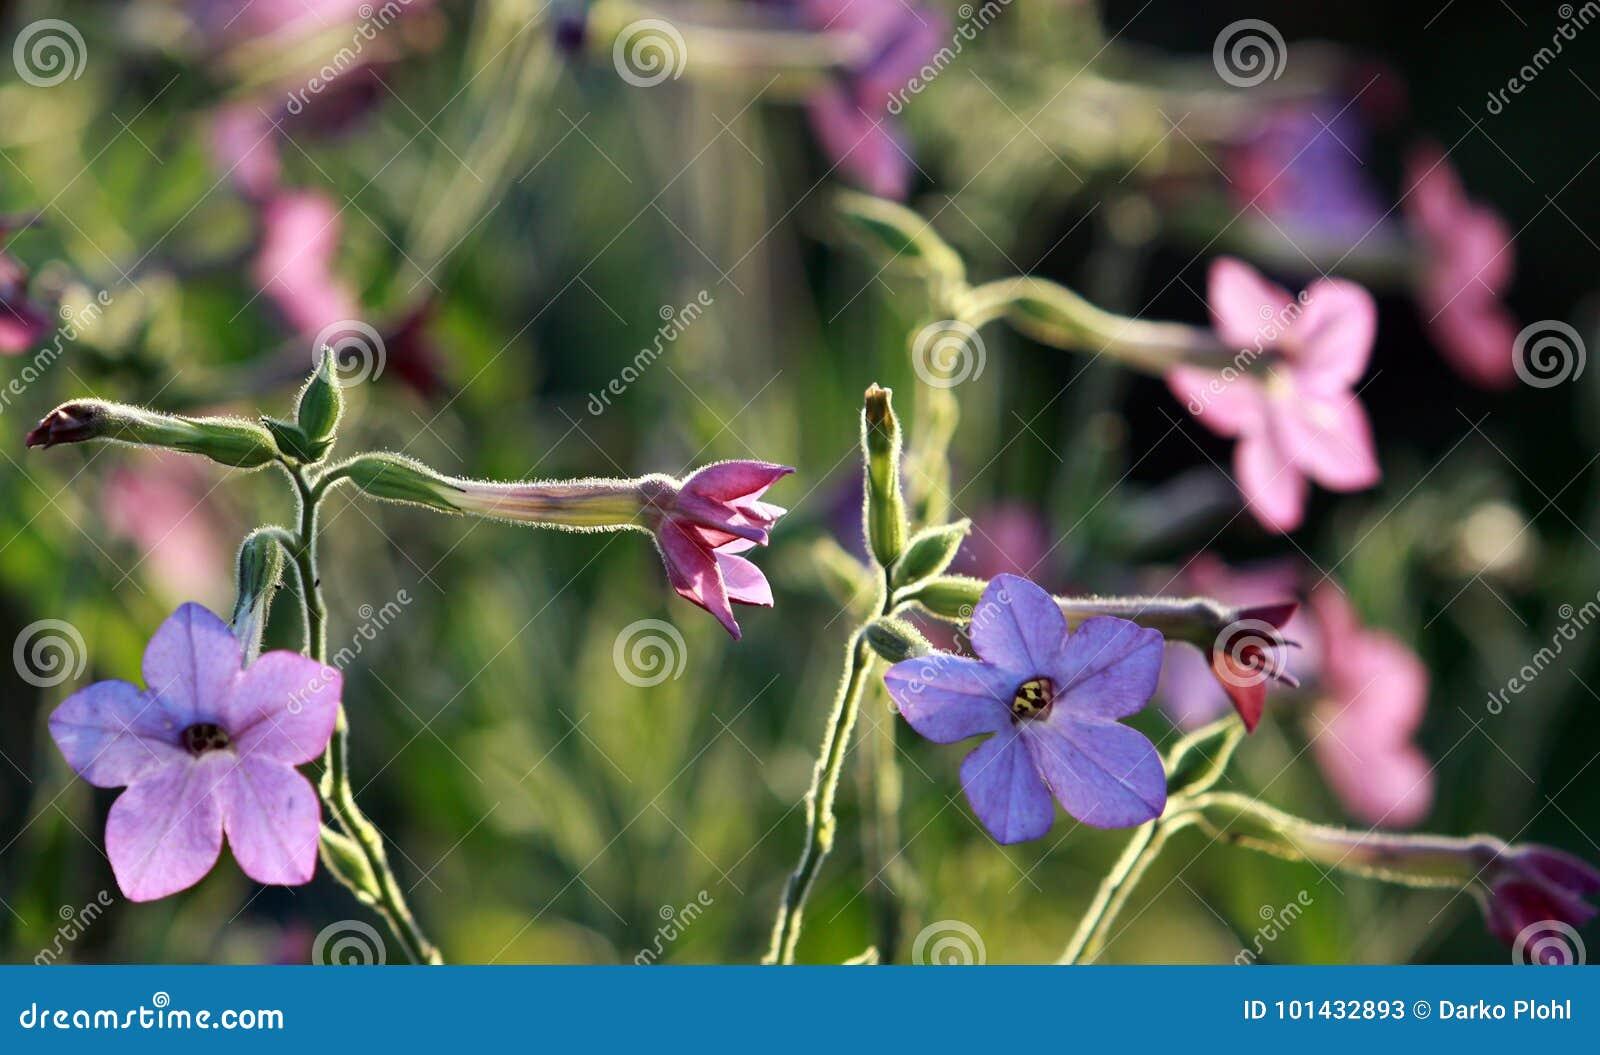 Jasmine tobacco pink and blue flowers stock image image of autumn jasmine tobacco pink and blue flowers izmirmasajfo